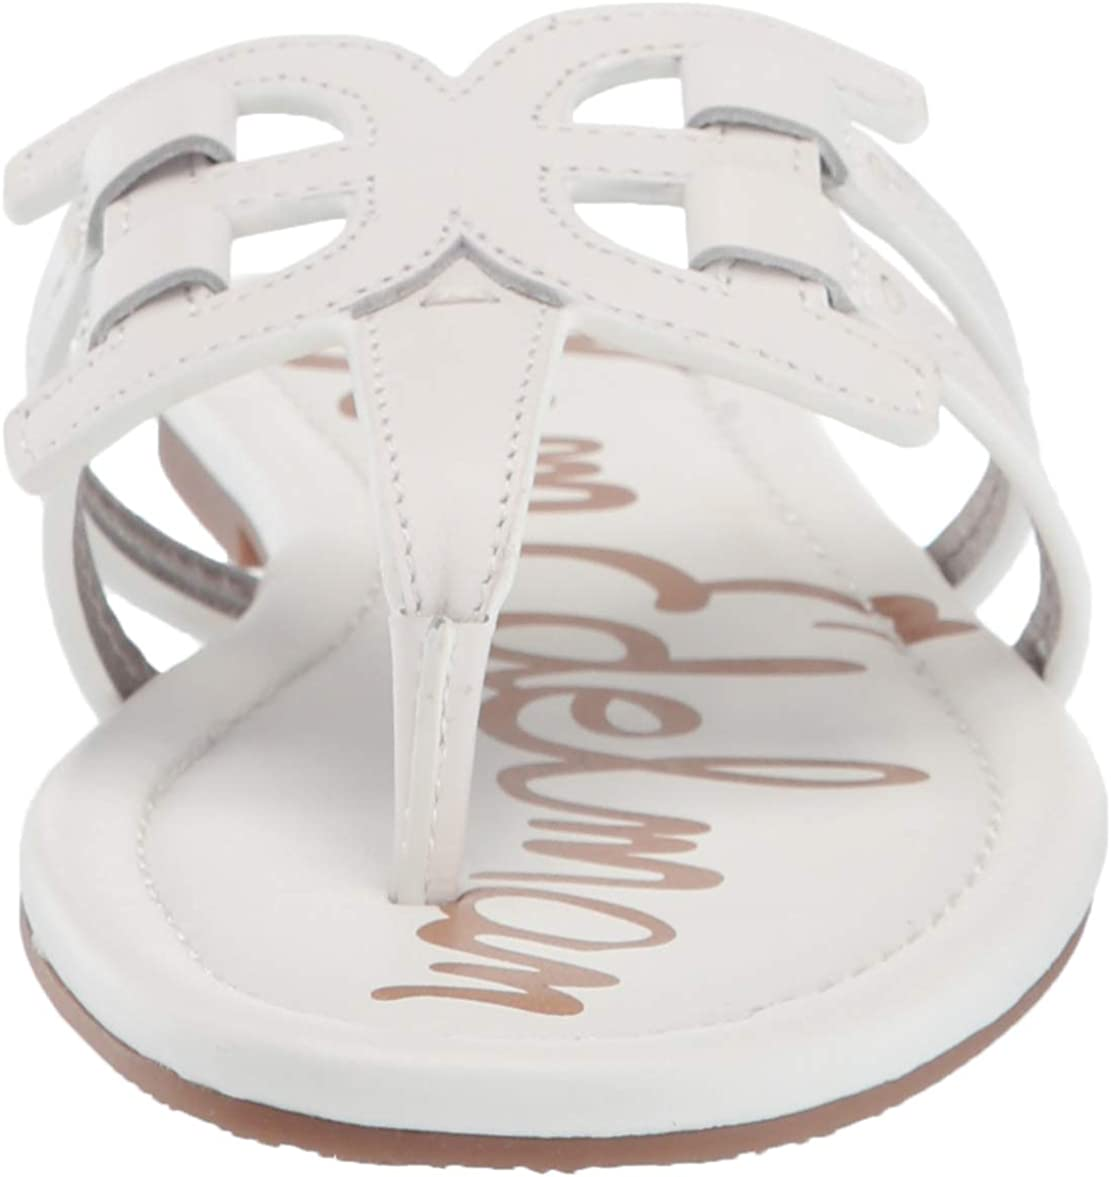 Sam Edelman - Sandales Cara Slide - Pour femme Bright White Leather